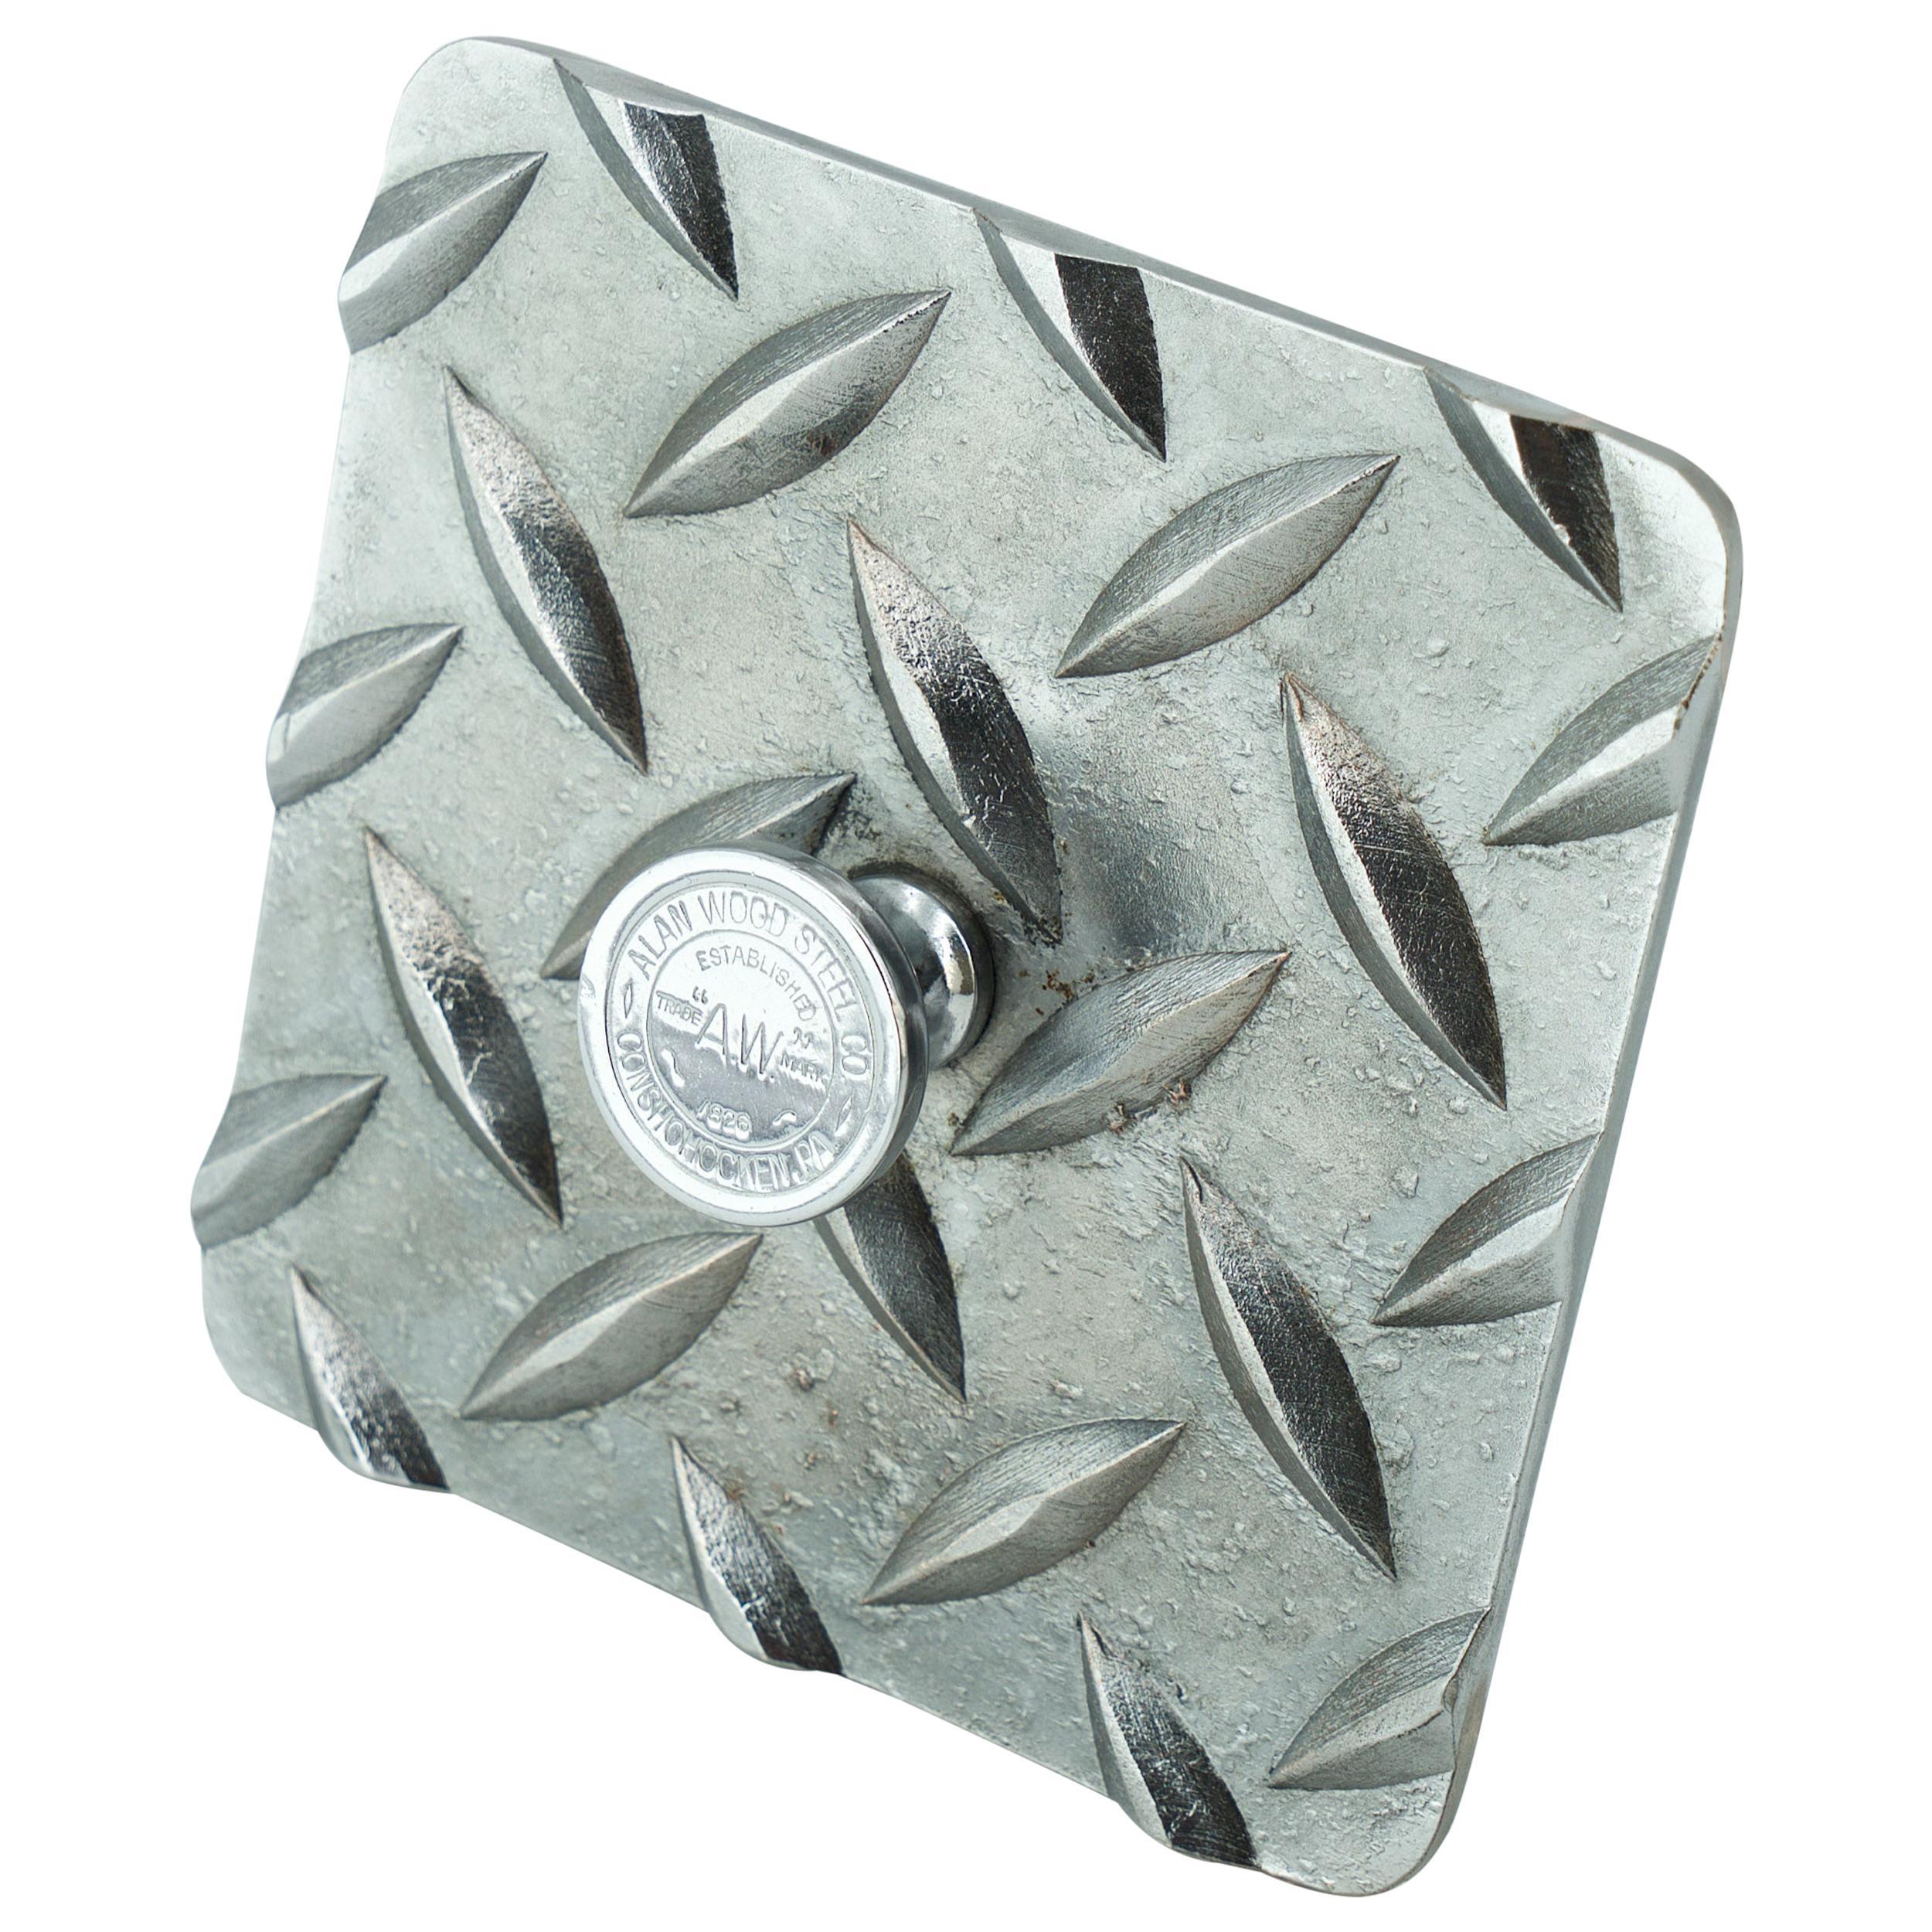 1930s Chrome Diamond Plate Paperweight Curiosity Desk Object Architect Sculpture